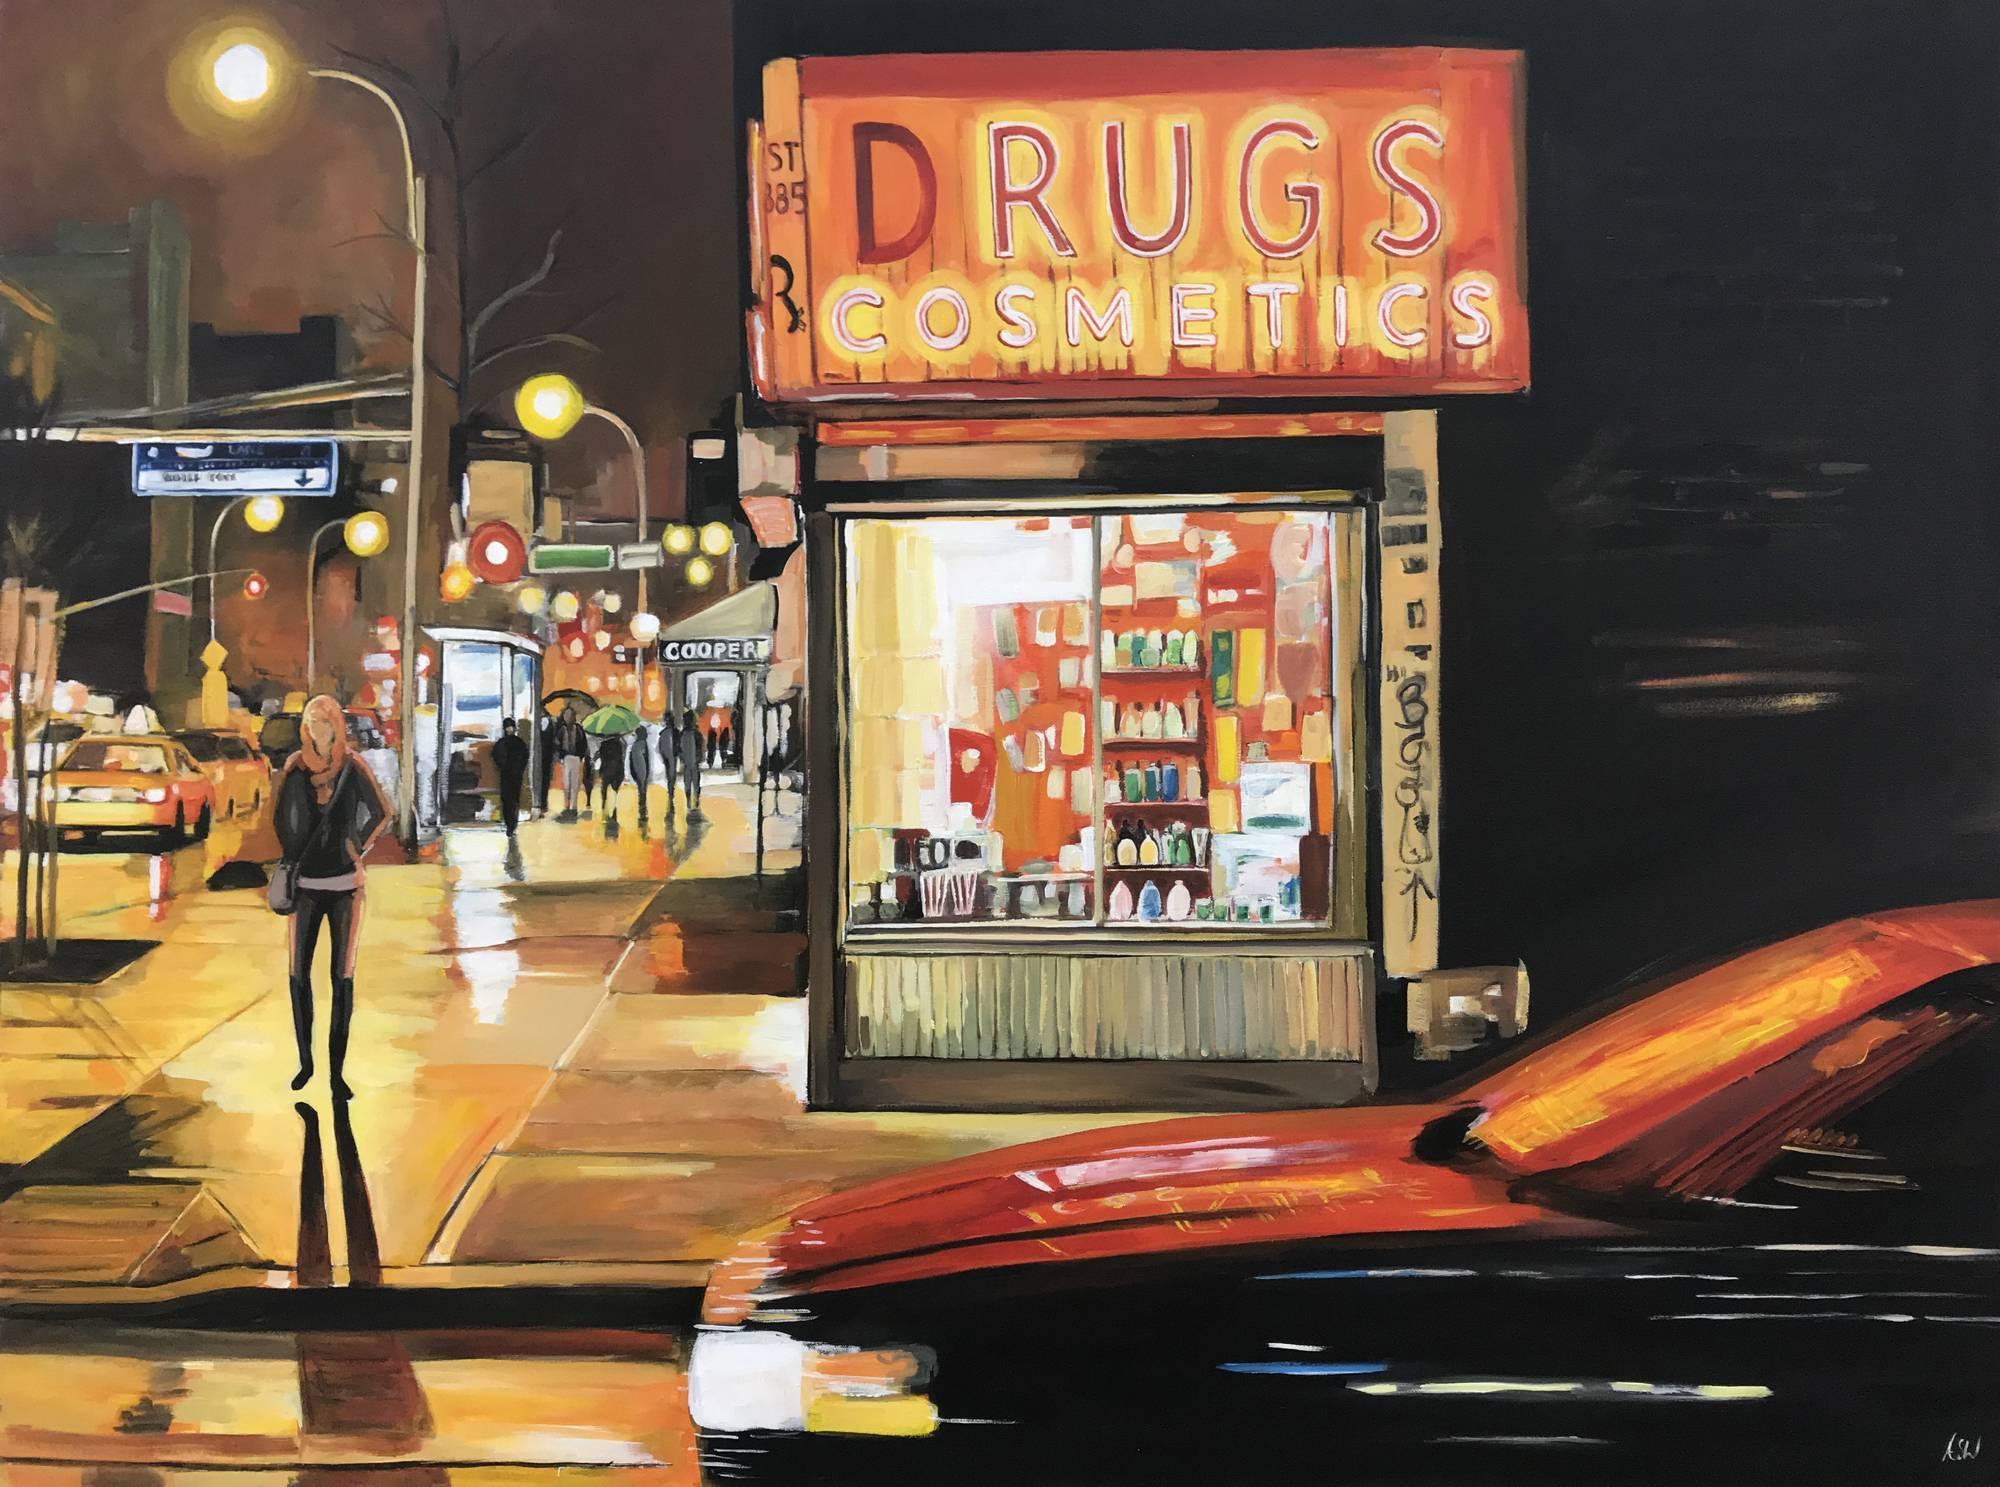 New York City Street Corner Painting by Leading British Urban Landscape Artist